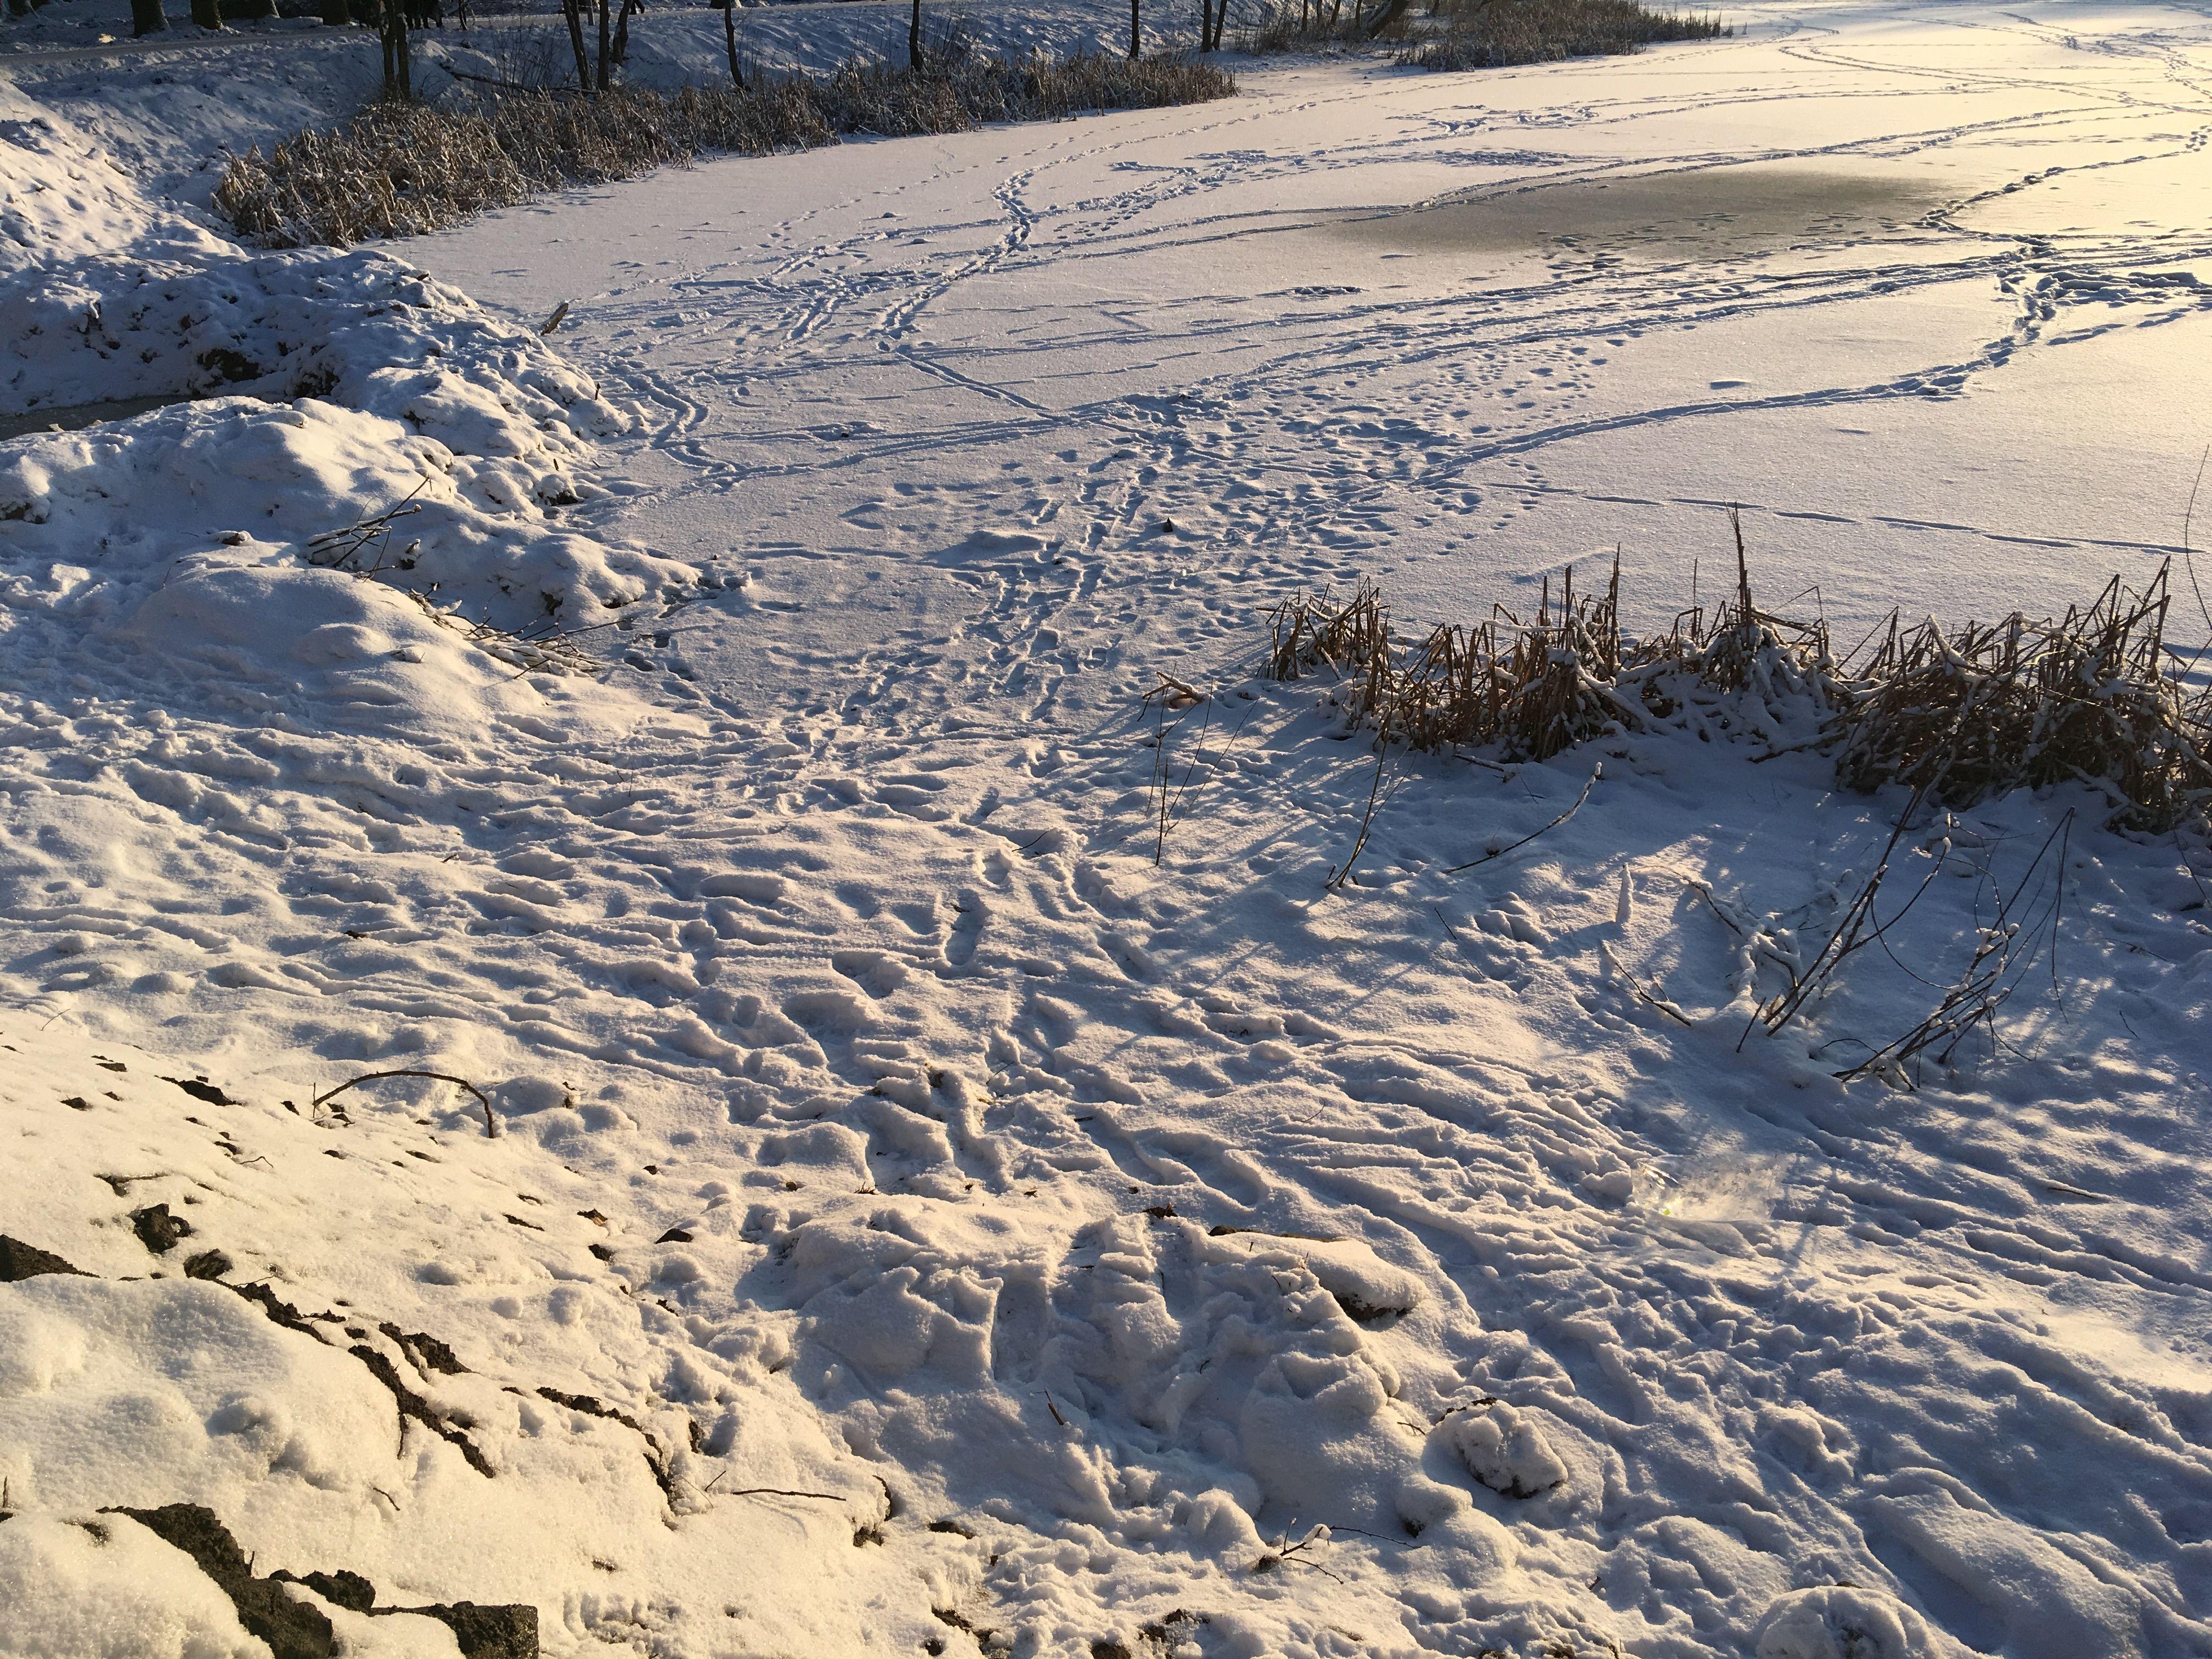 Участок, на котором была разбросана арматура на льду